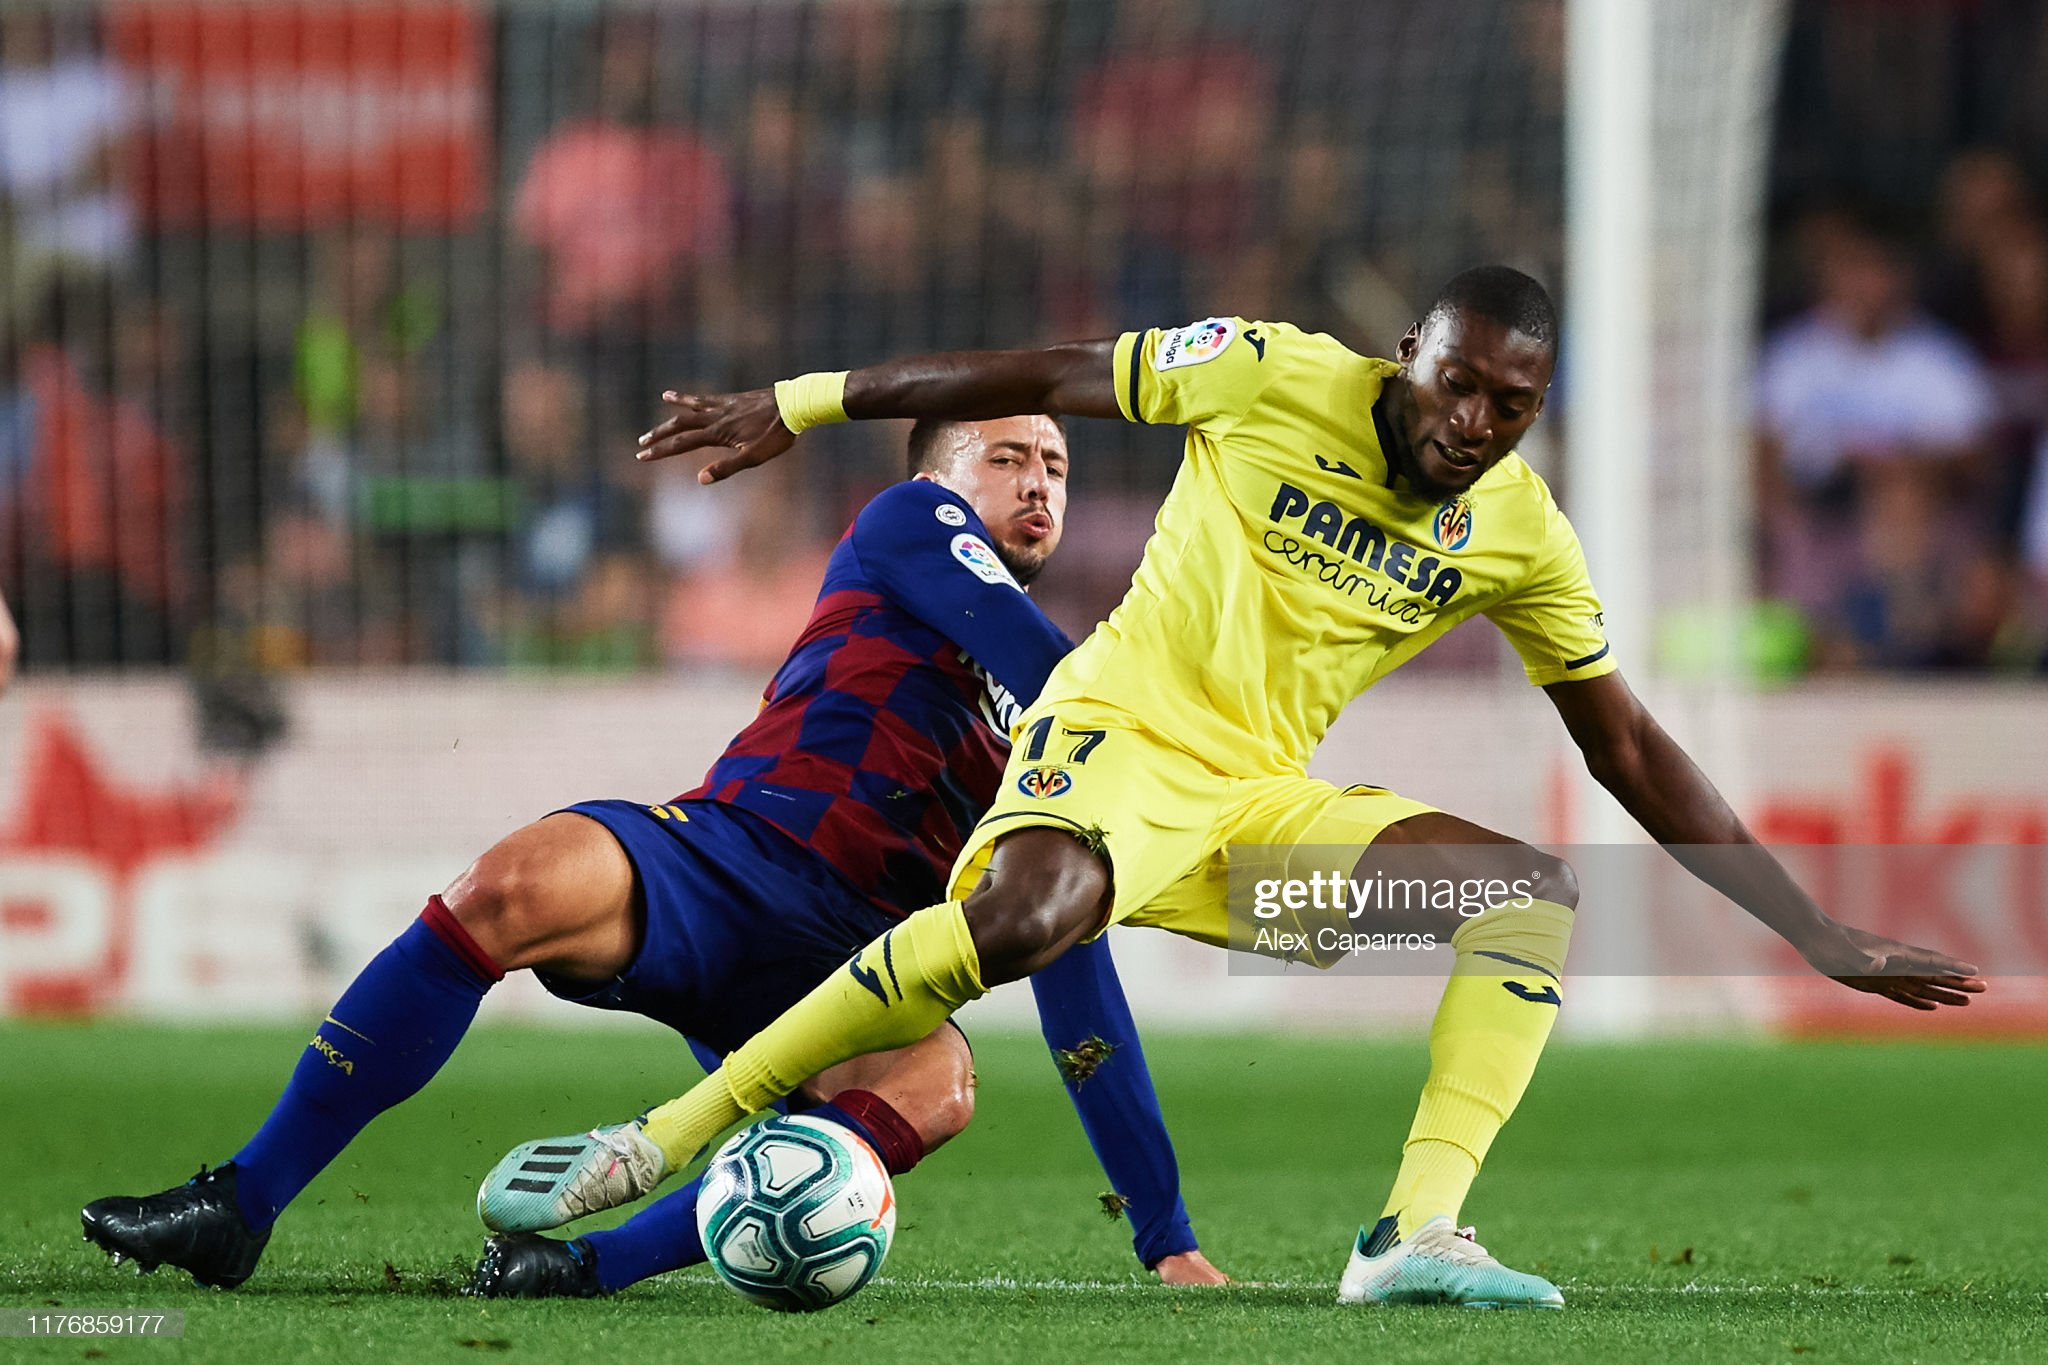 صور مباراة : برشلونة - فياريال 2-1 ( 24-09-2019 )  Clement-lenglet-of-fc-barcelona-tackles-toko-ekambi-of-villarreal-cf-picture-id1176859177?s=2048x2048